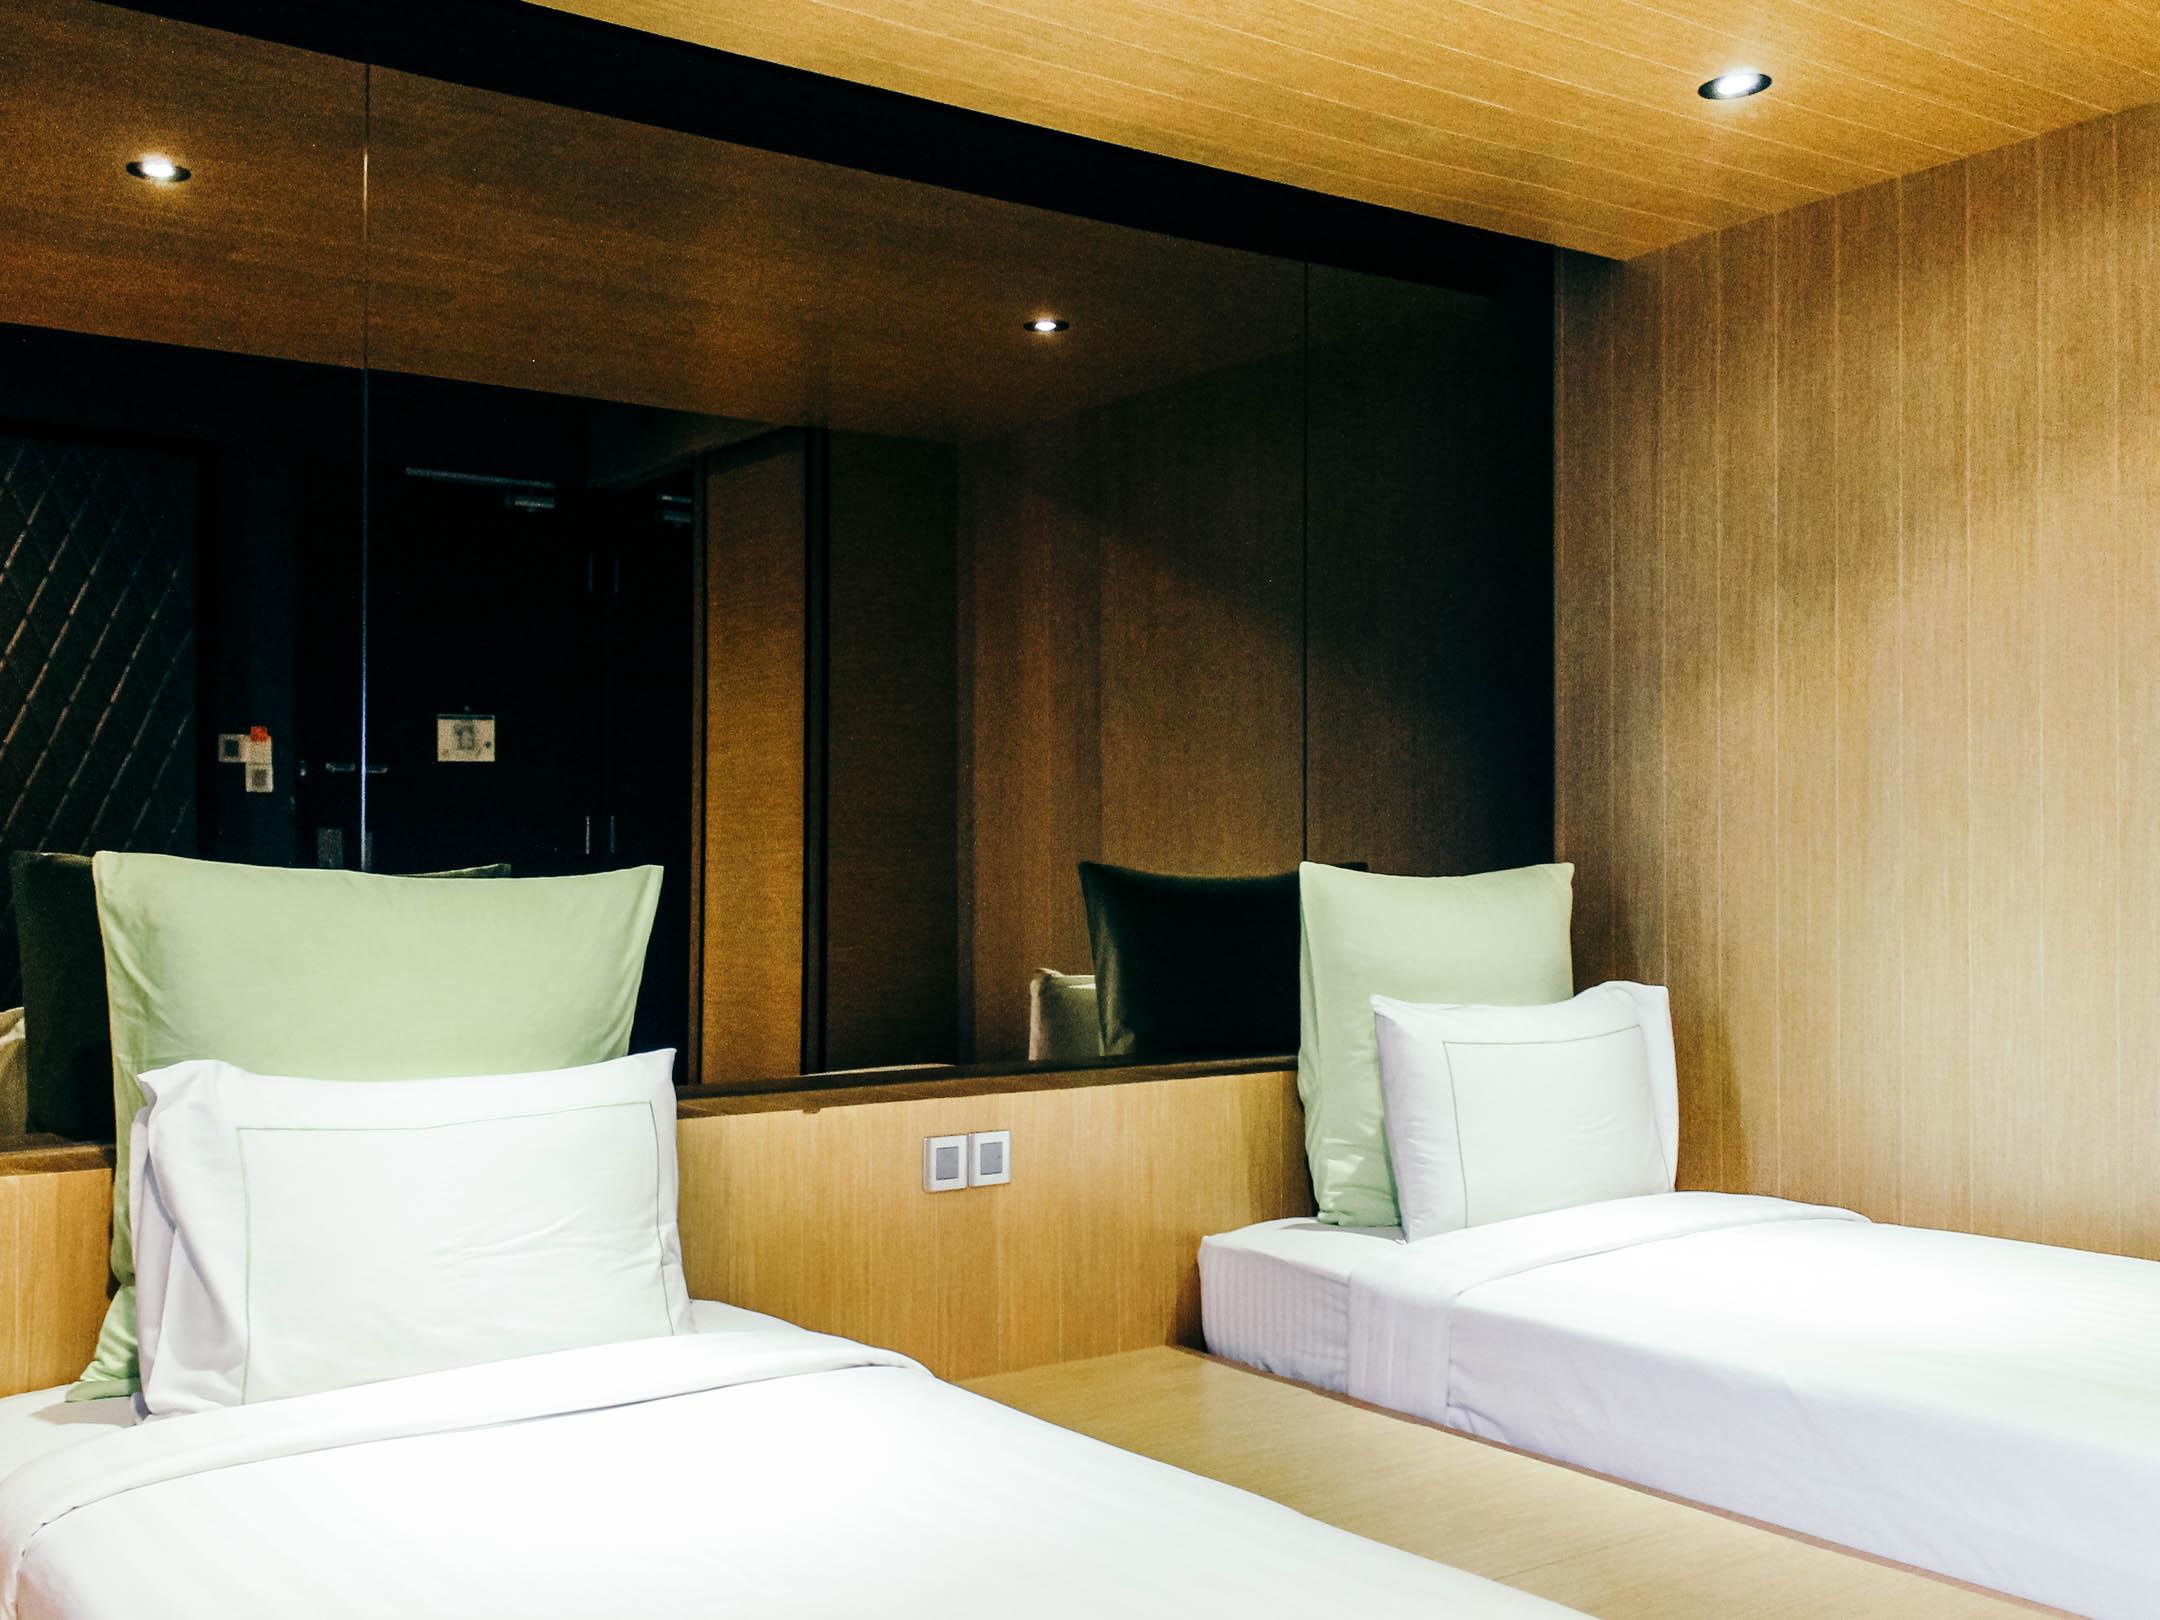 Sleep in kuala lumpur wolo bukit bintang artelounge for Affordable furniture kuala lumpur